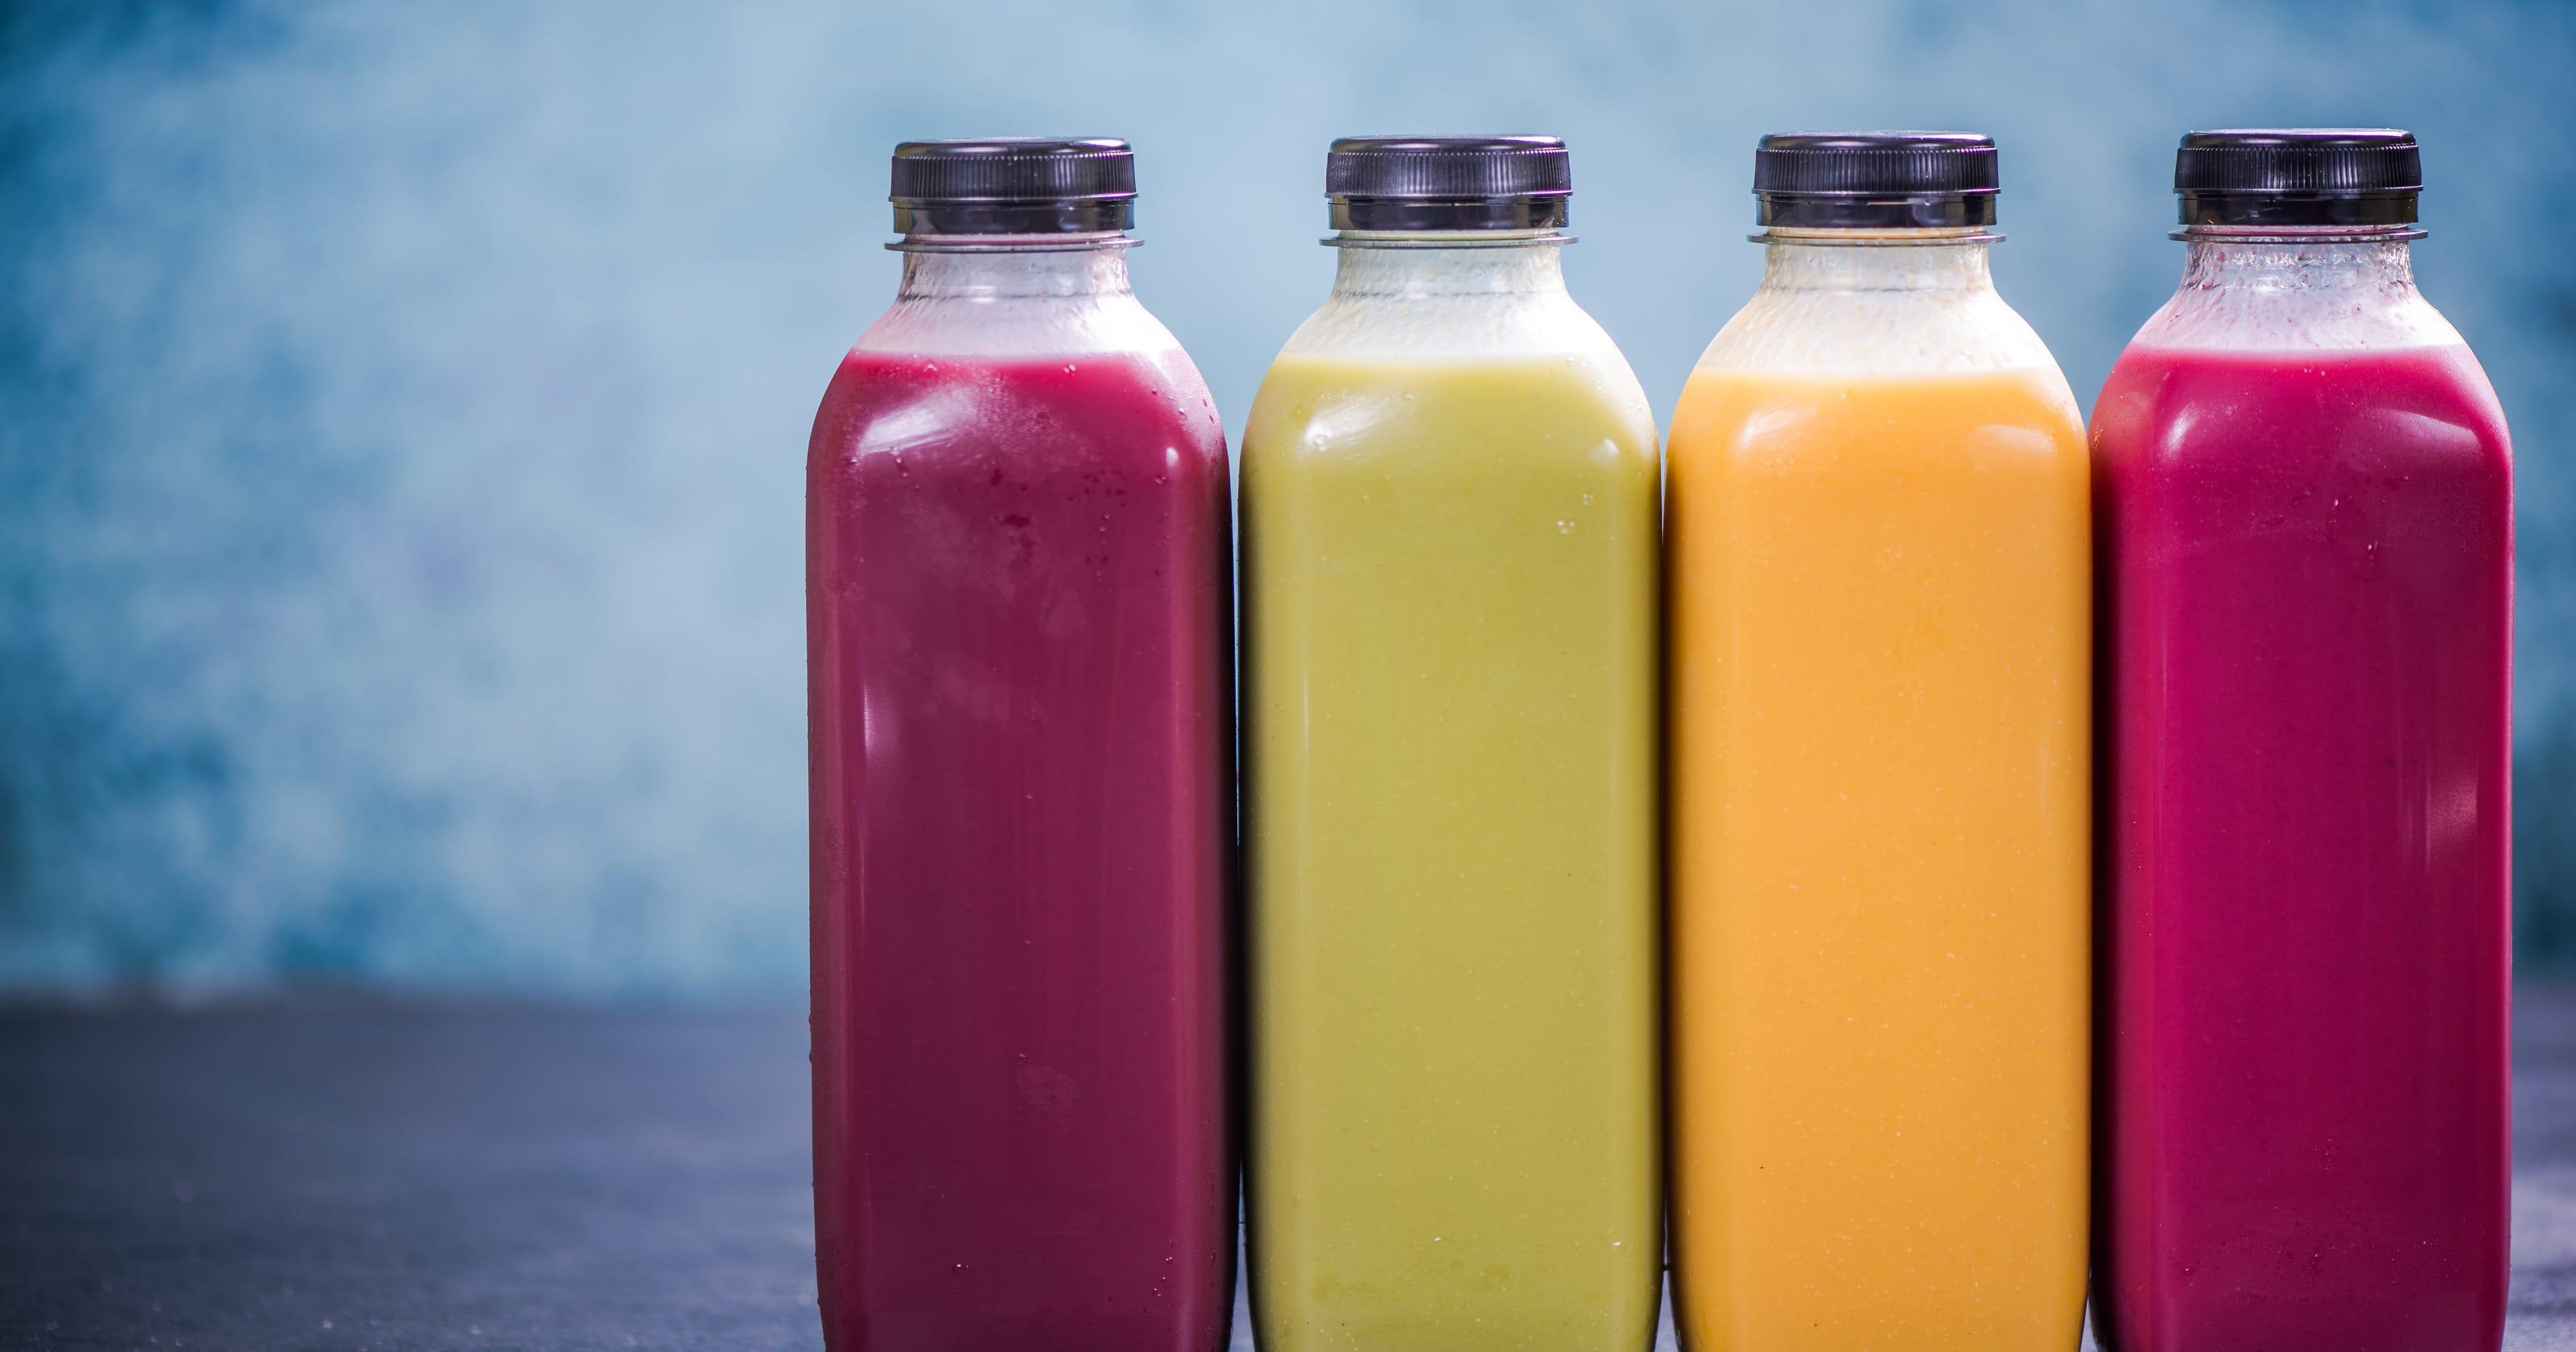 Body Detox Do Juice Cleanses Work